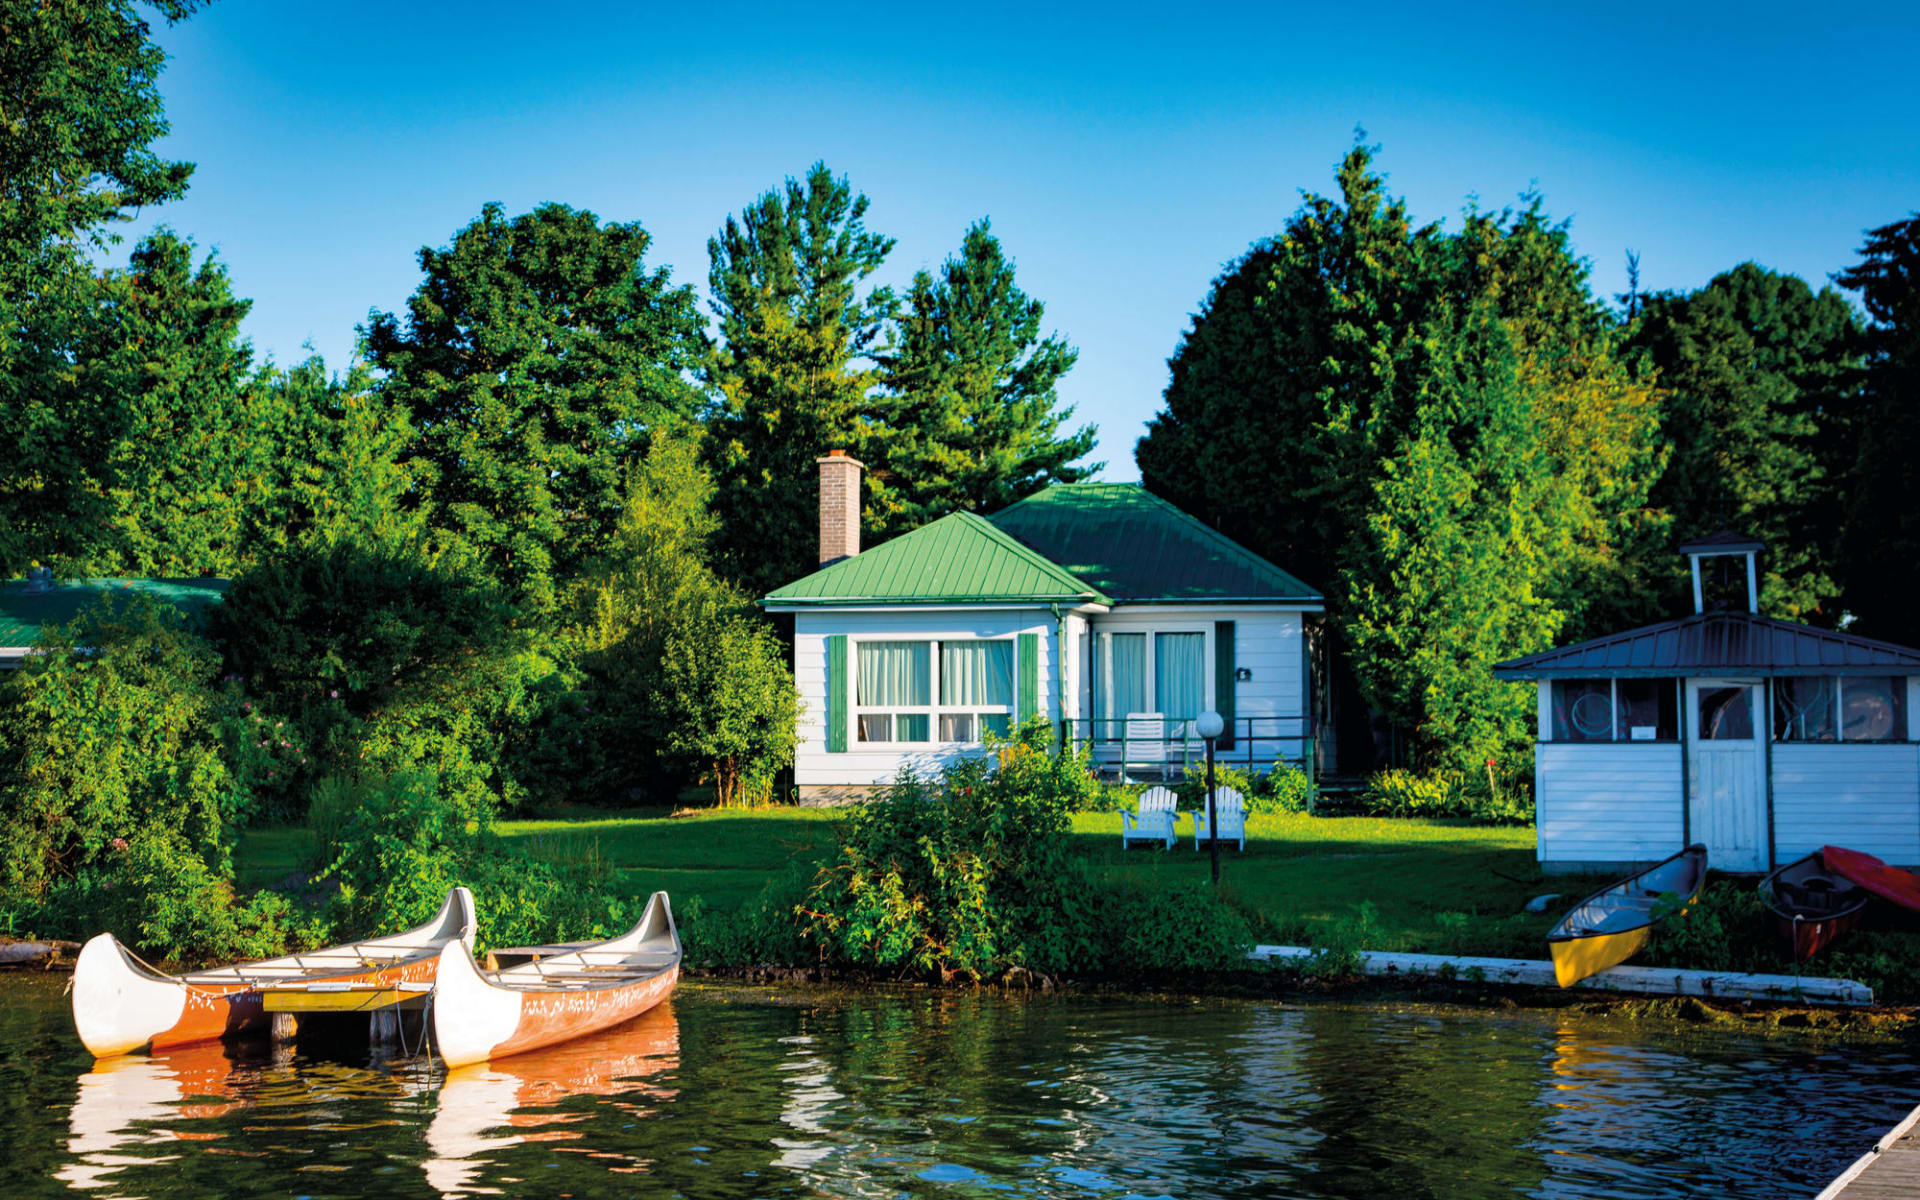 Elmhirst's Resort in Keene:  Elmhirst's Resort_Cottage&Canoes